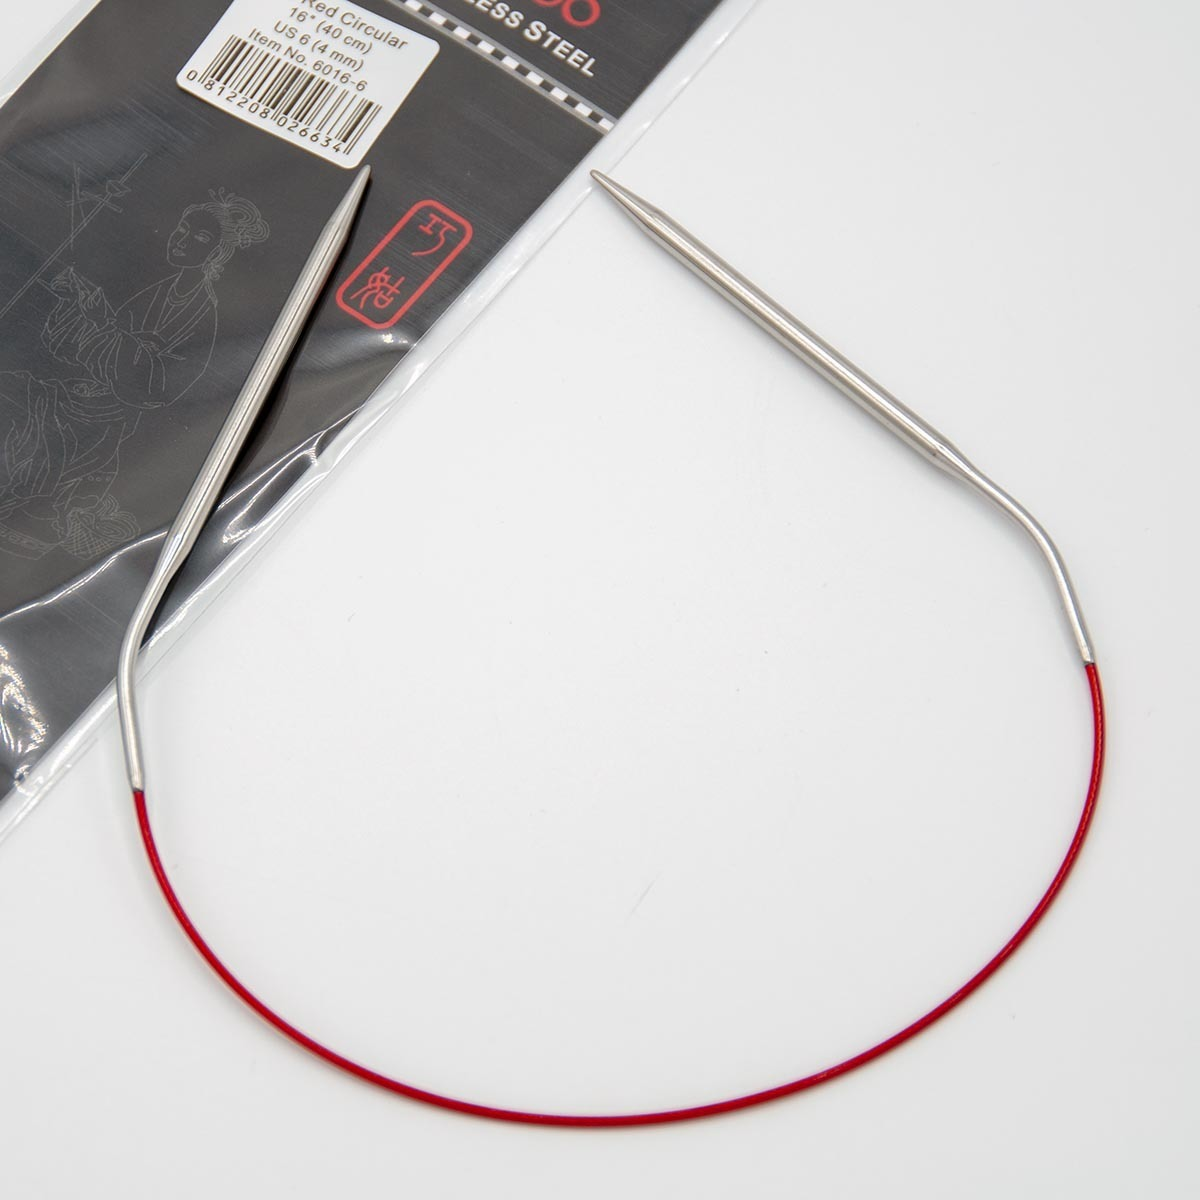 Cпицы металлические круговые Knit Red, ChiaoGoo